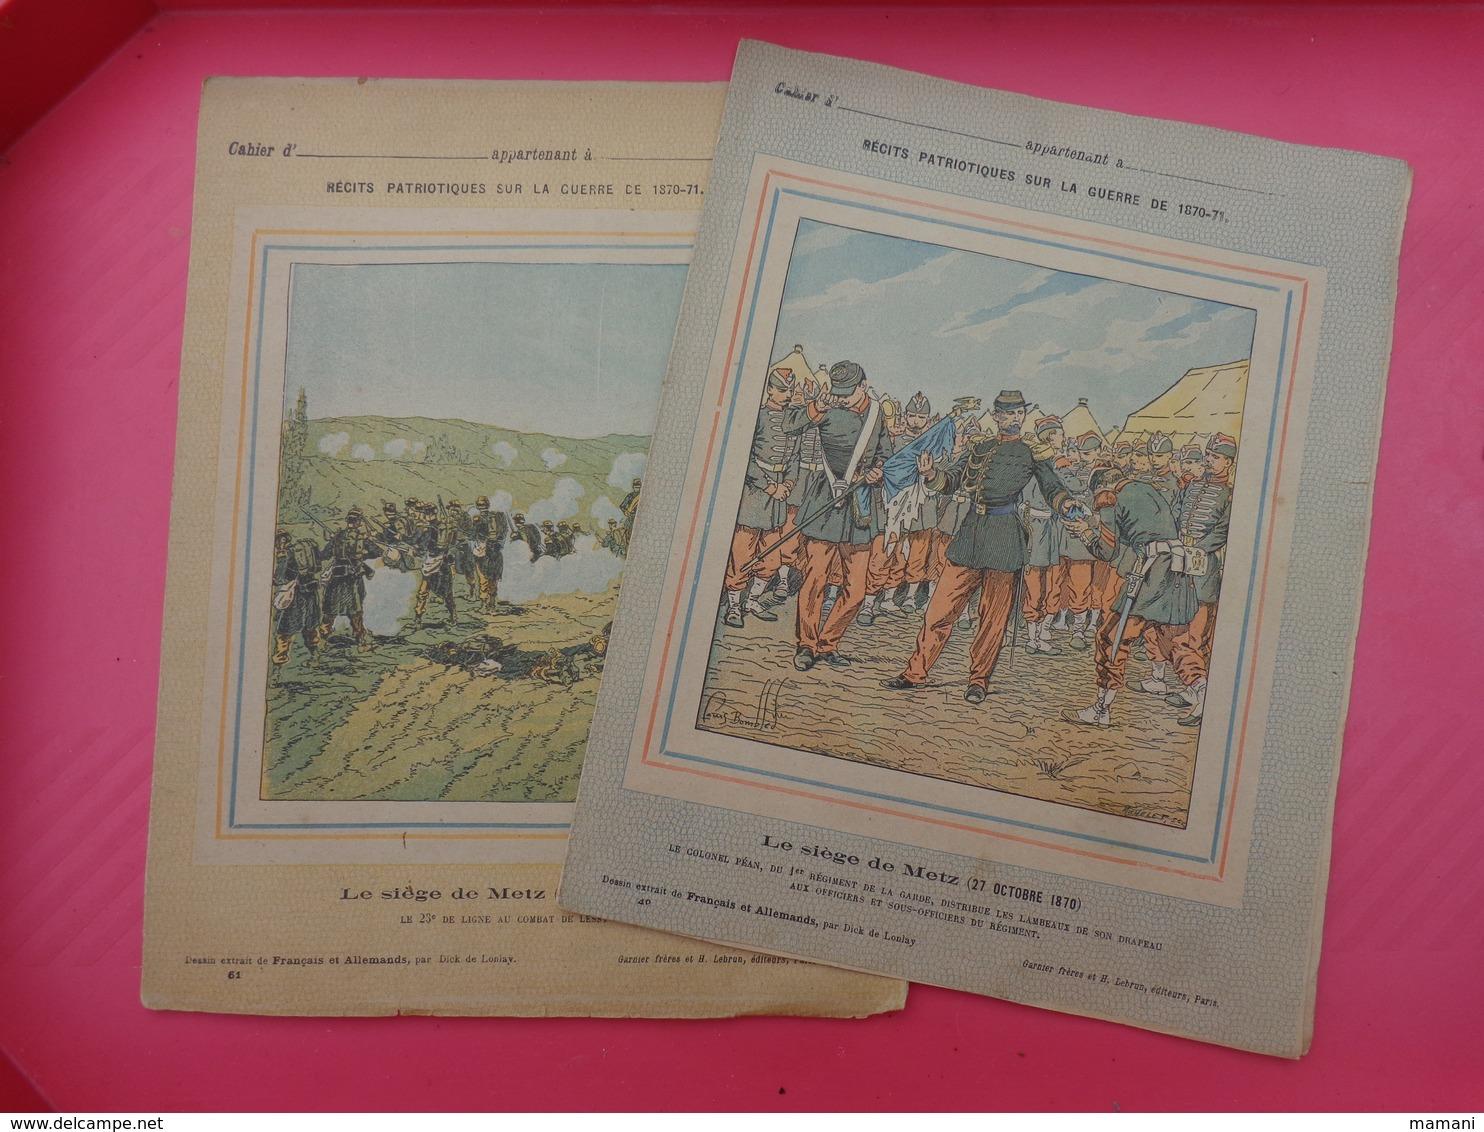 2 Protege Cahier Recits Patriotiques N° 61-49 Sous Reserve-+-1 Protege Cahier Ou Dossier --pub Stylo Librairie Gilbert - Protège-cahiers